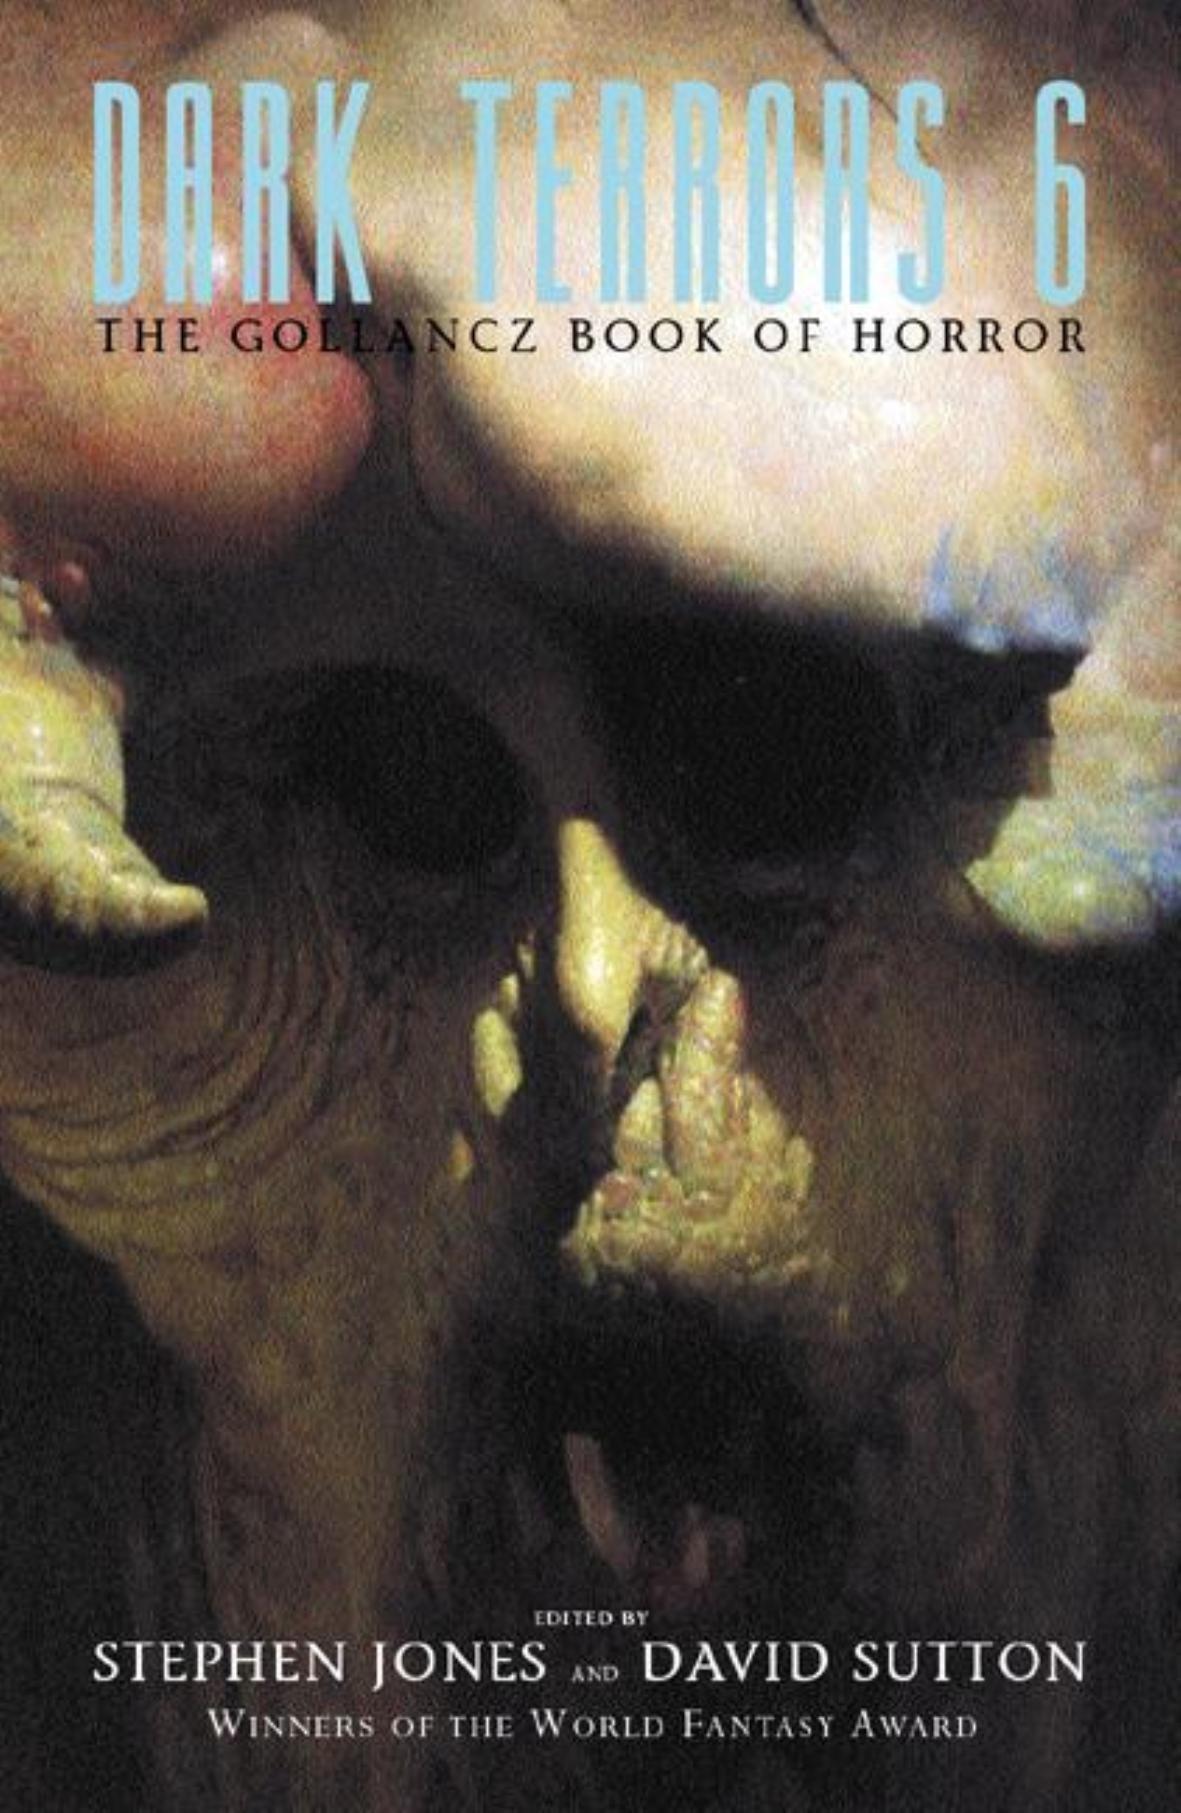 The Gollancz Book of Horror (Bk. 6) PDF